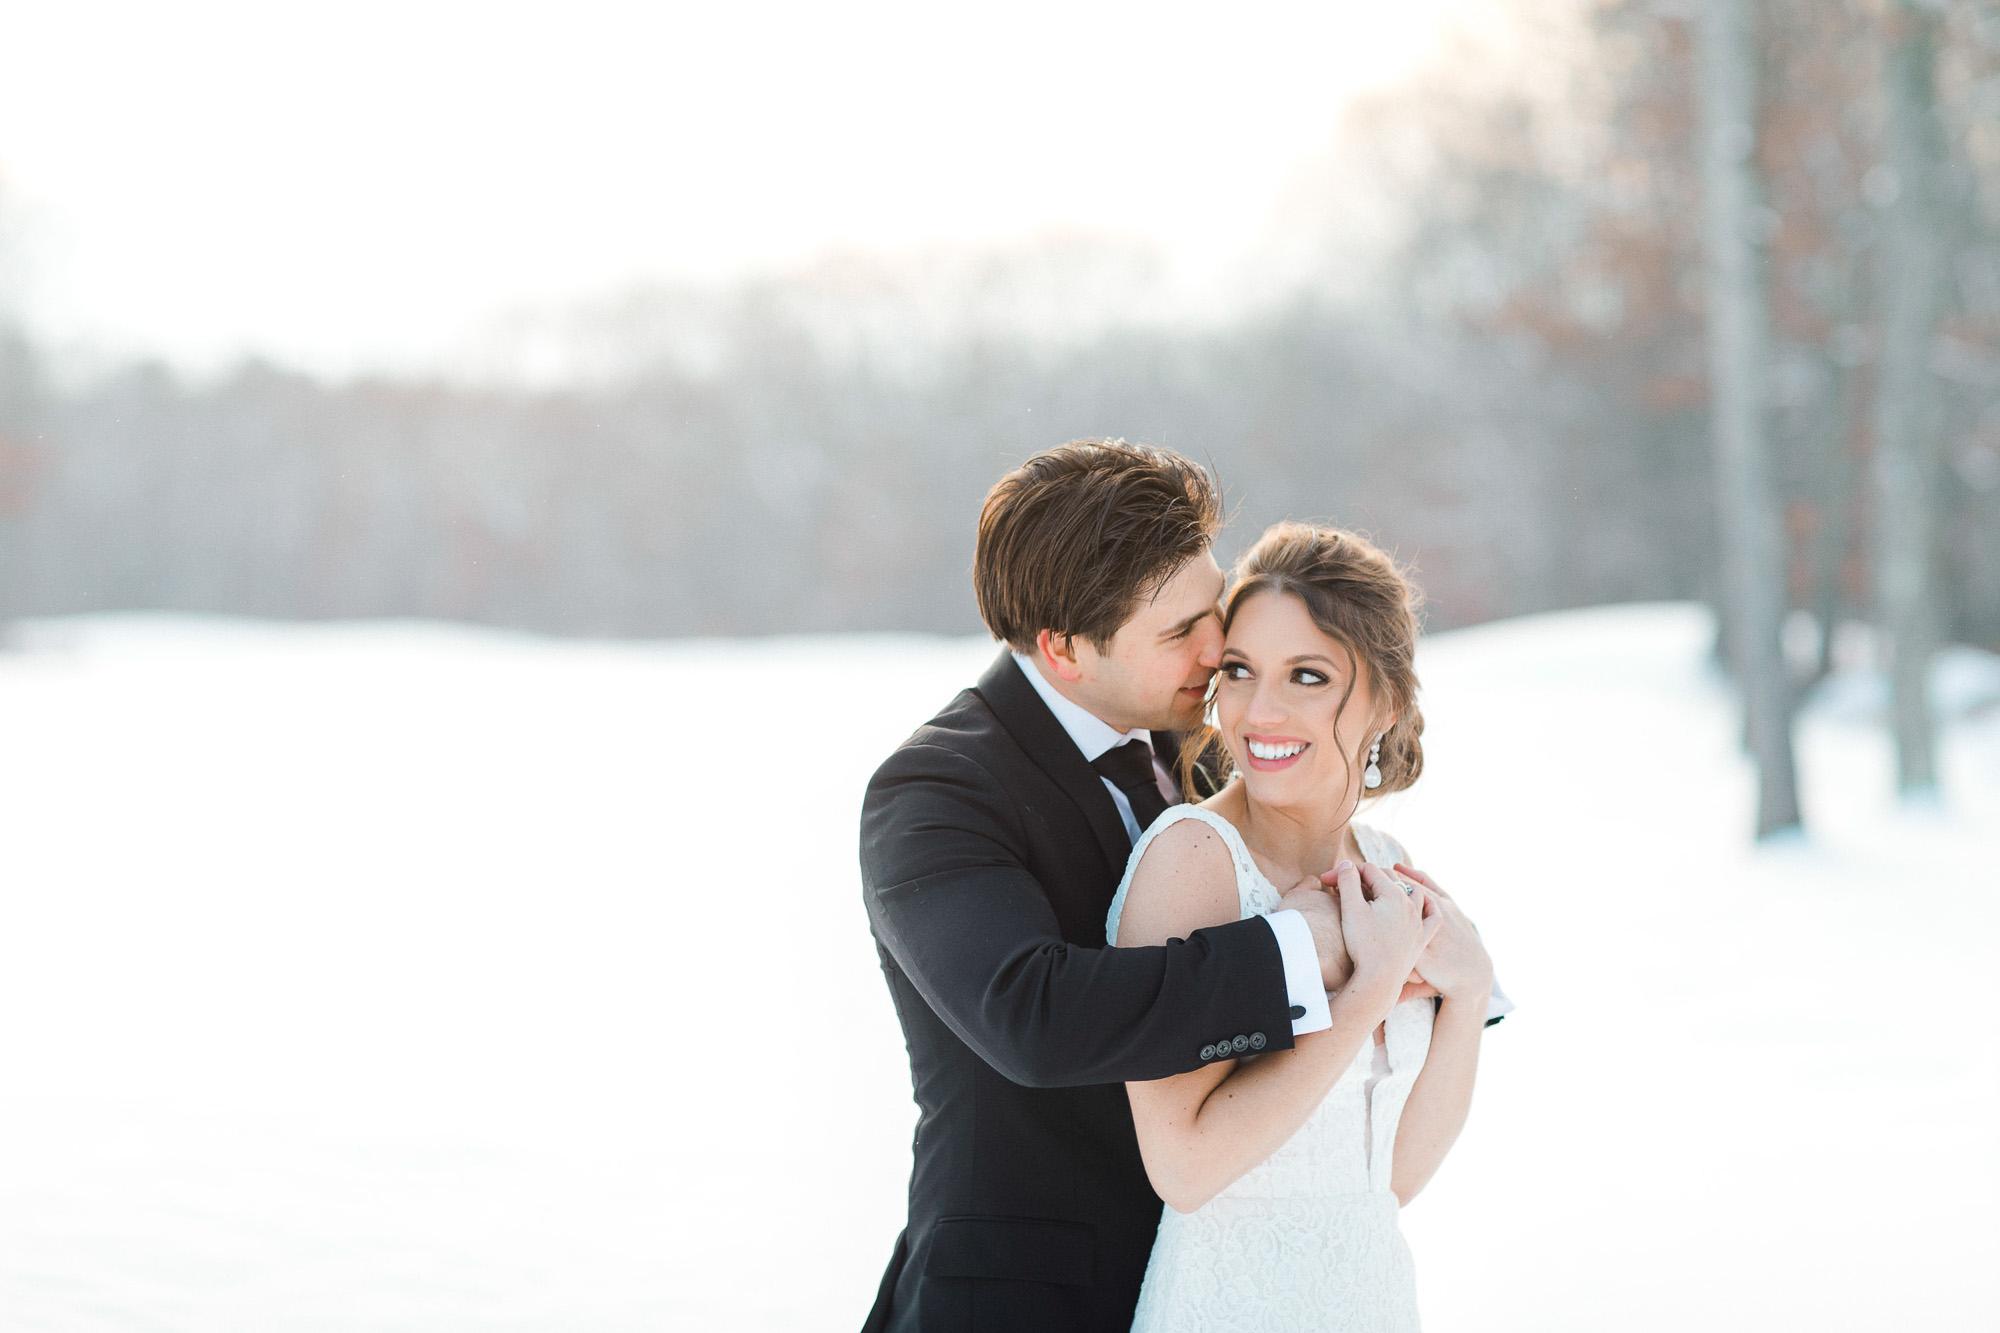 snowy-sand-springs-country-club-drums-pa-christmas-wedding-24888.jpg